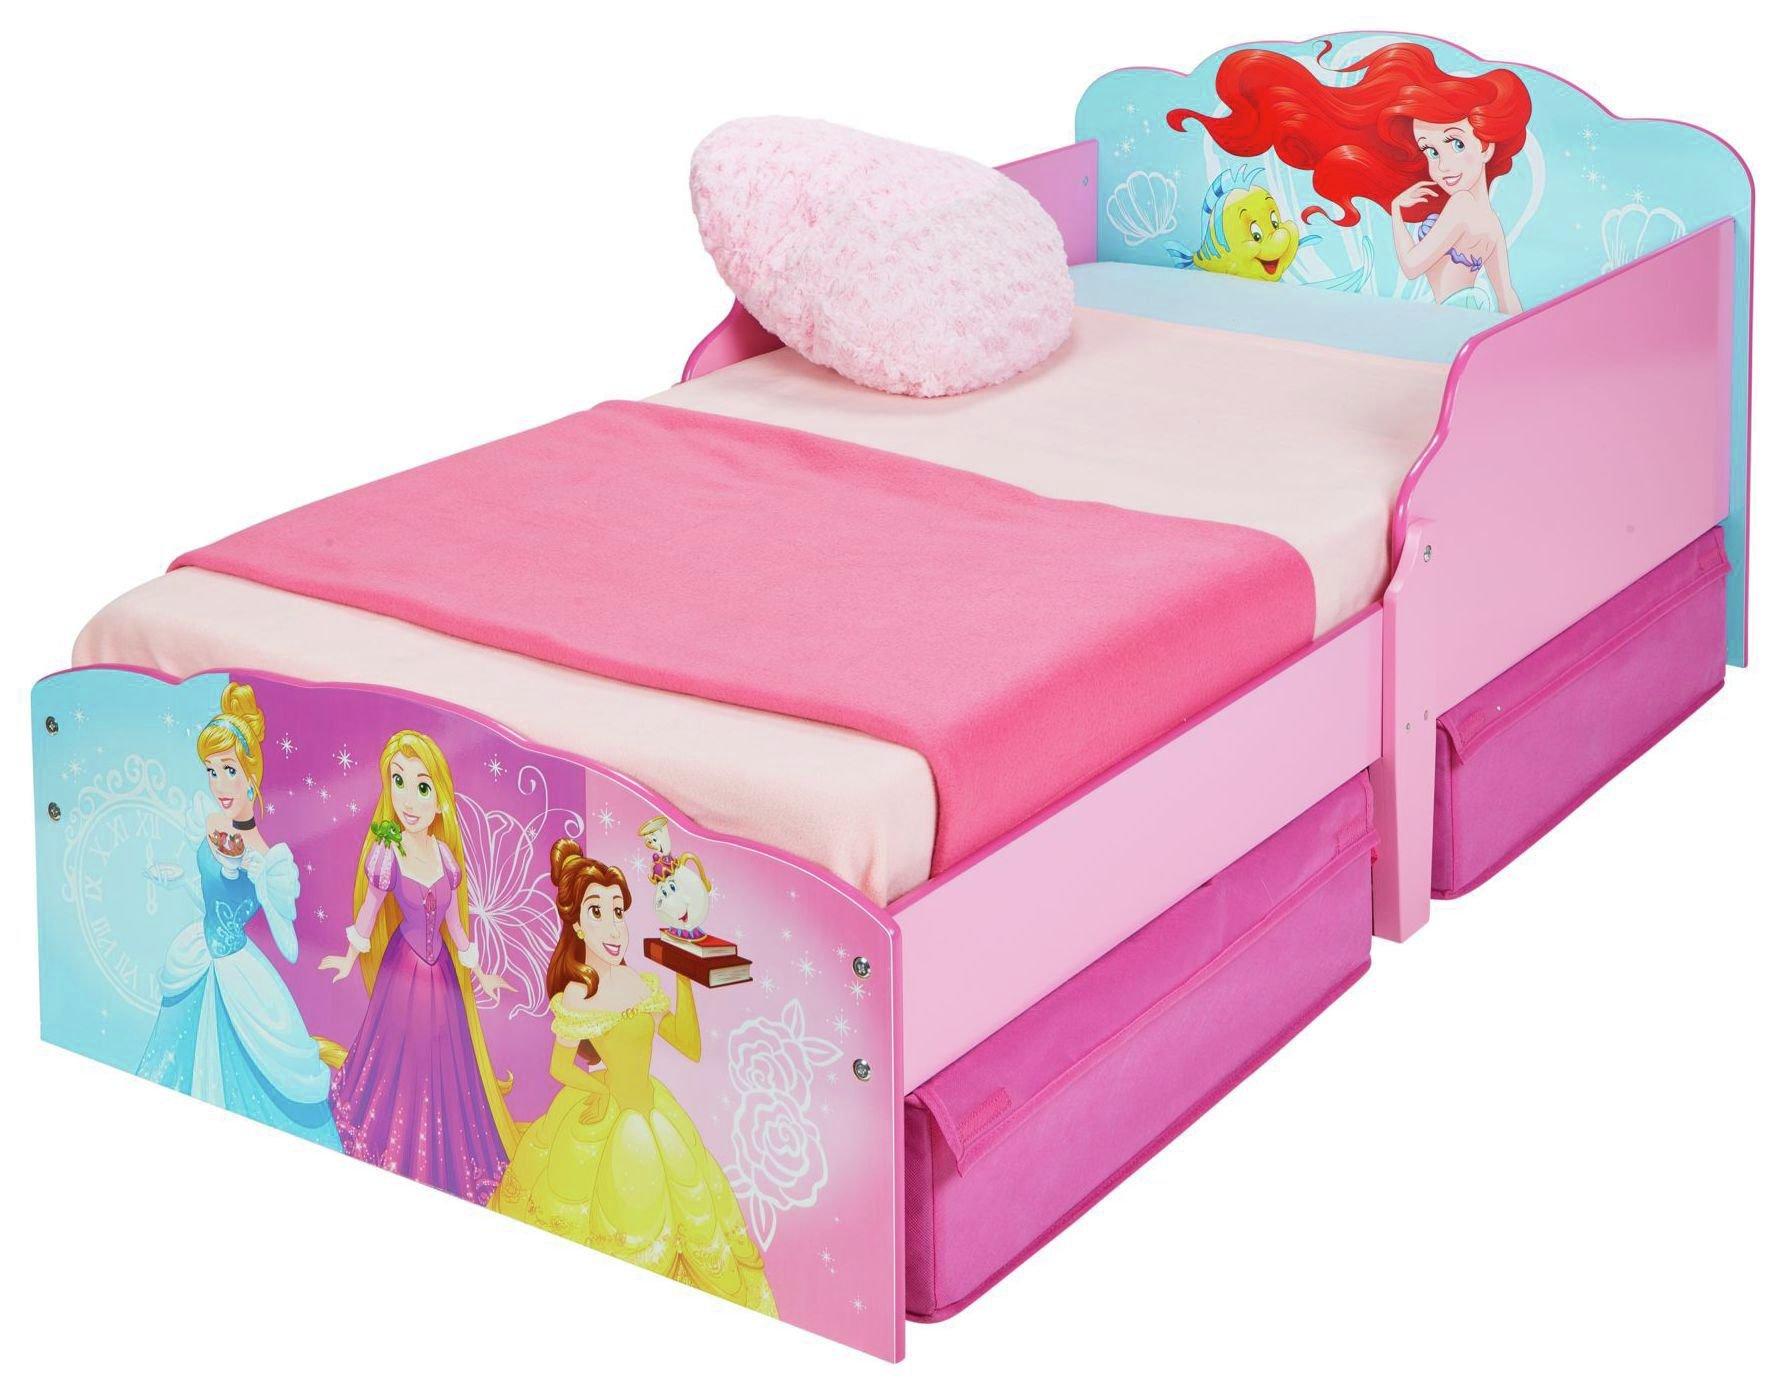 Disney Princess Carriage Bed Disney Princess Carriage Bed